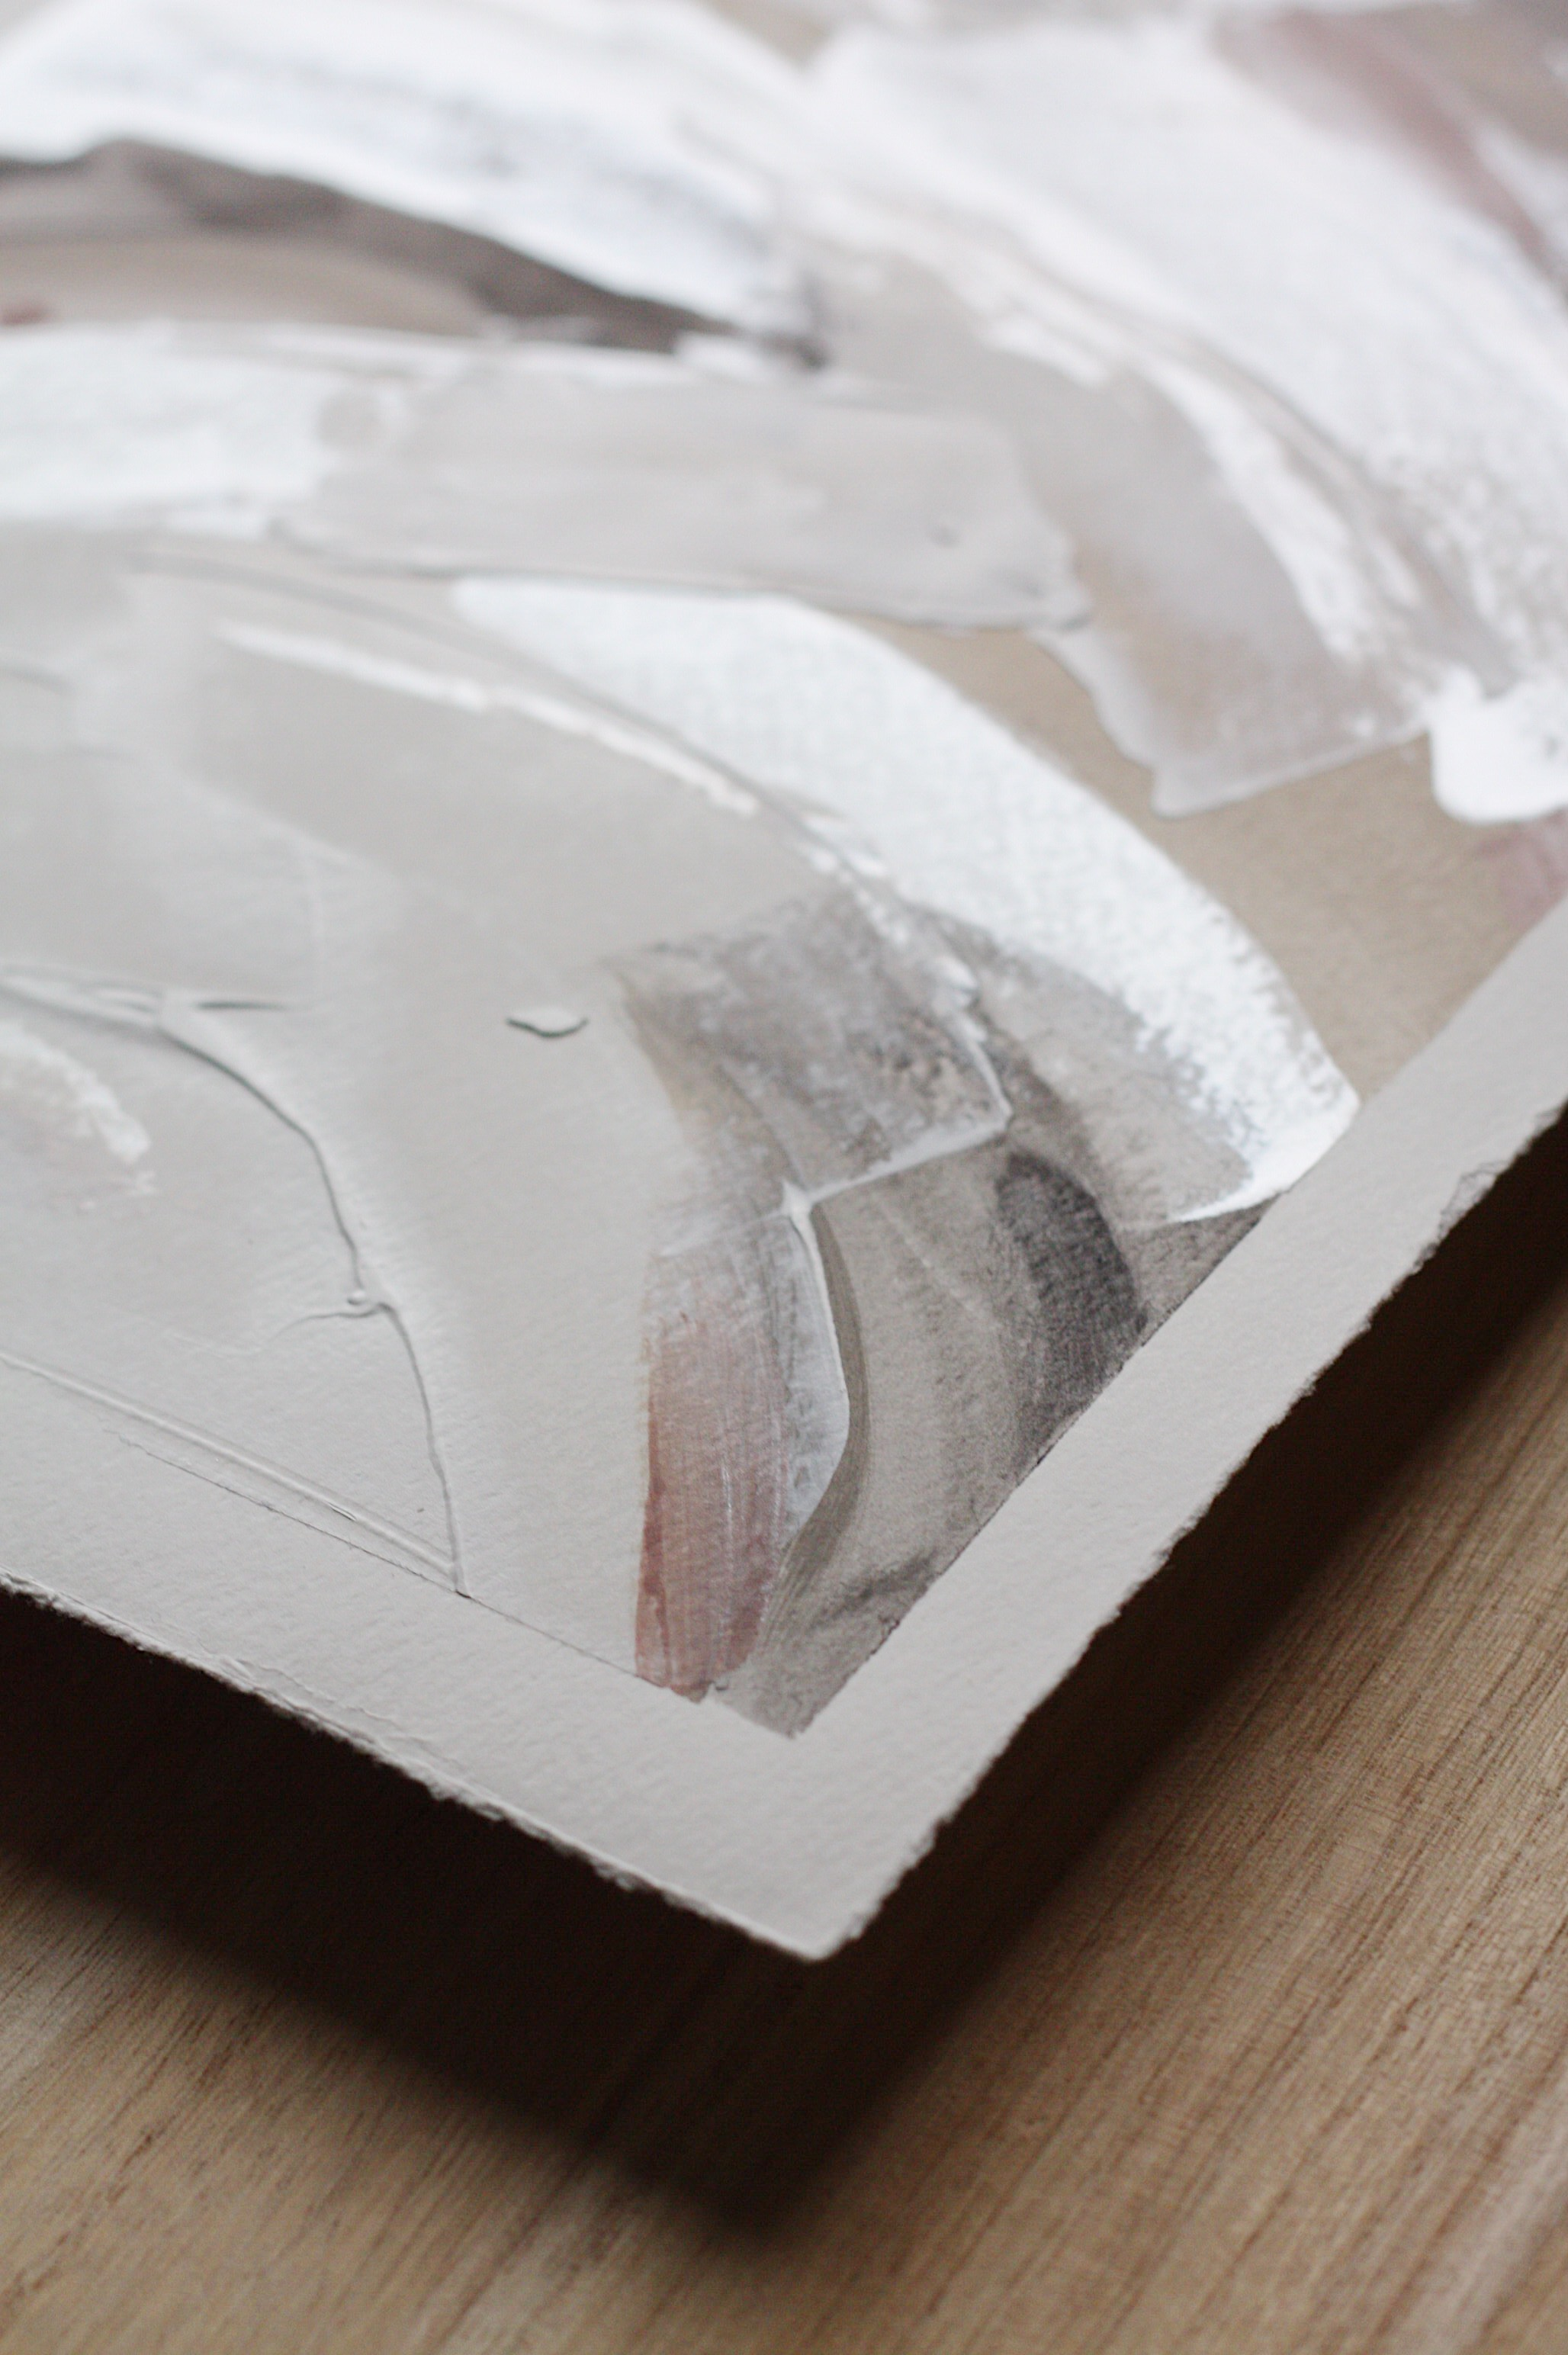 Lindsay Gilmore Original Abstract Art Constraints Series Sand Storm details 11x14 on paper.JPG